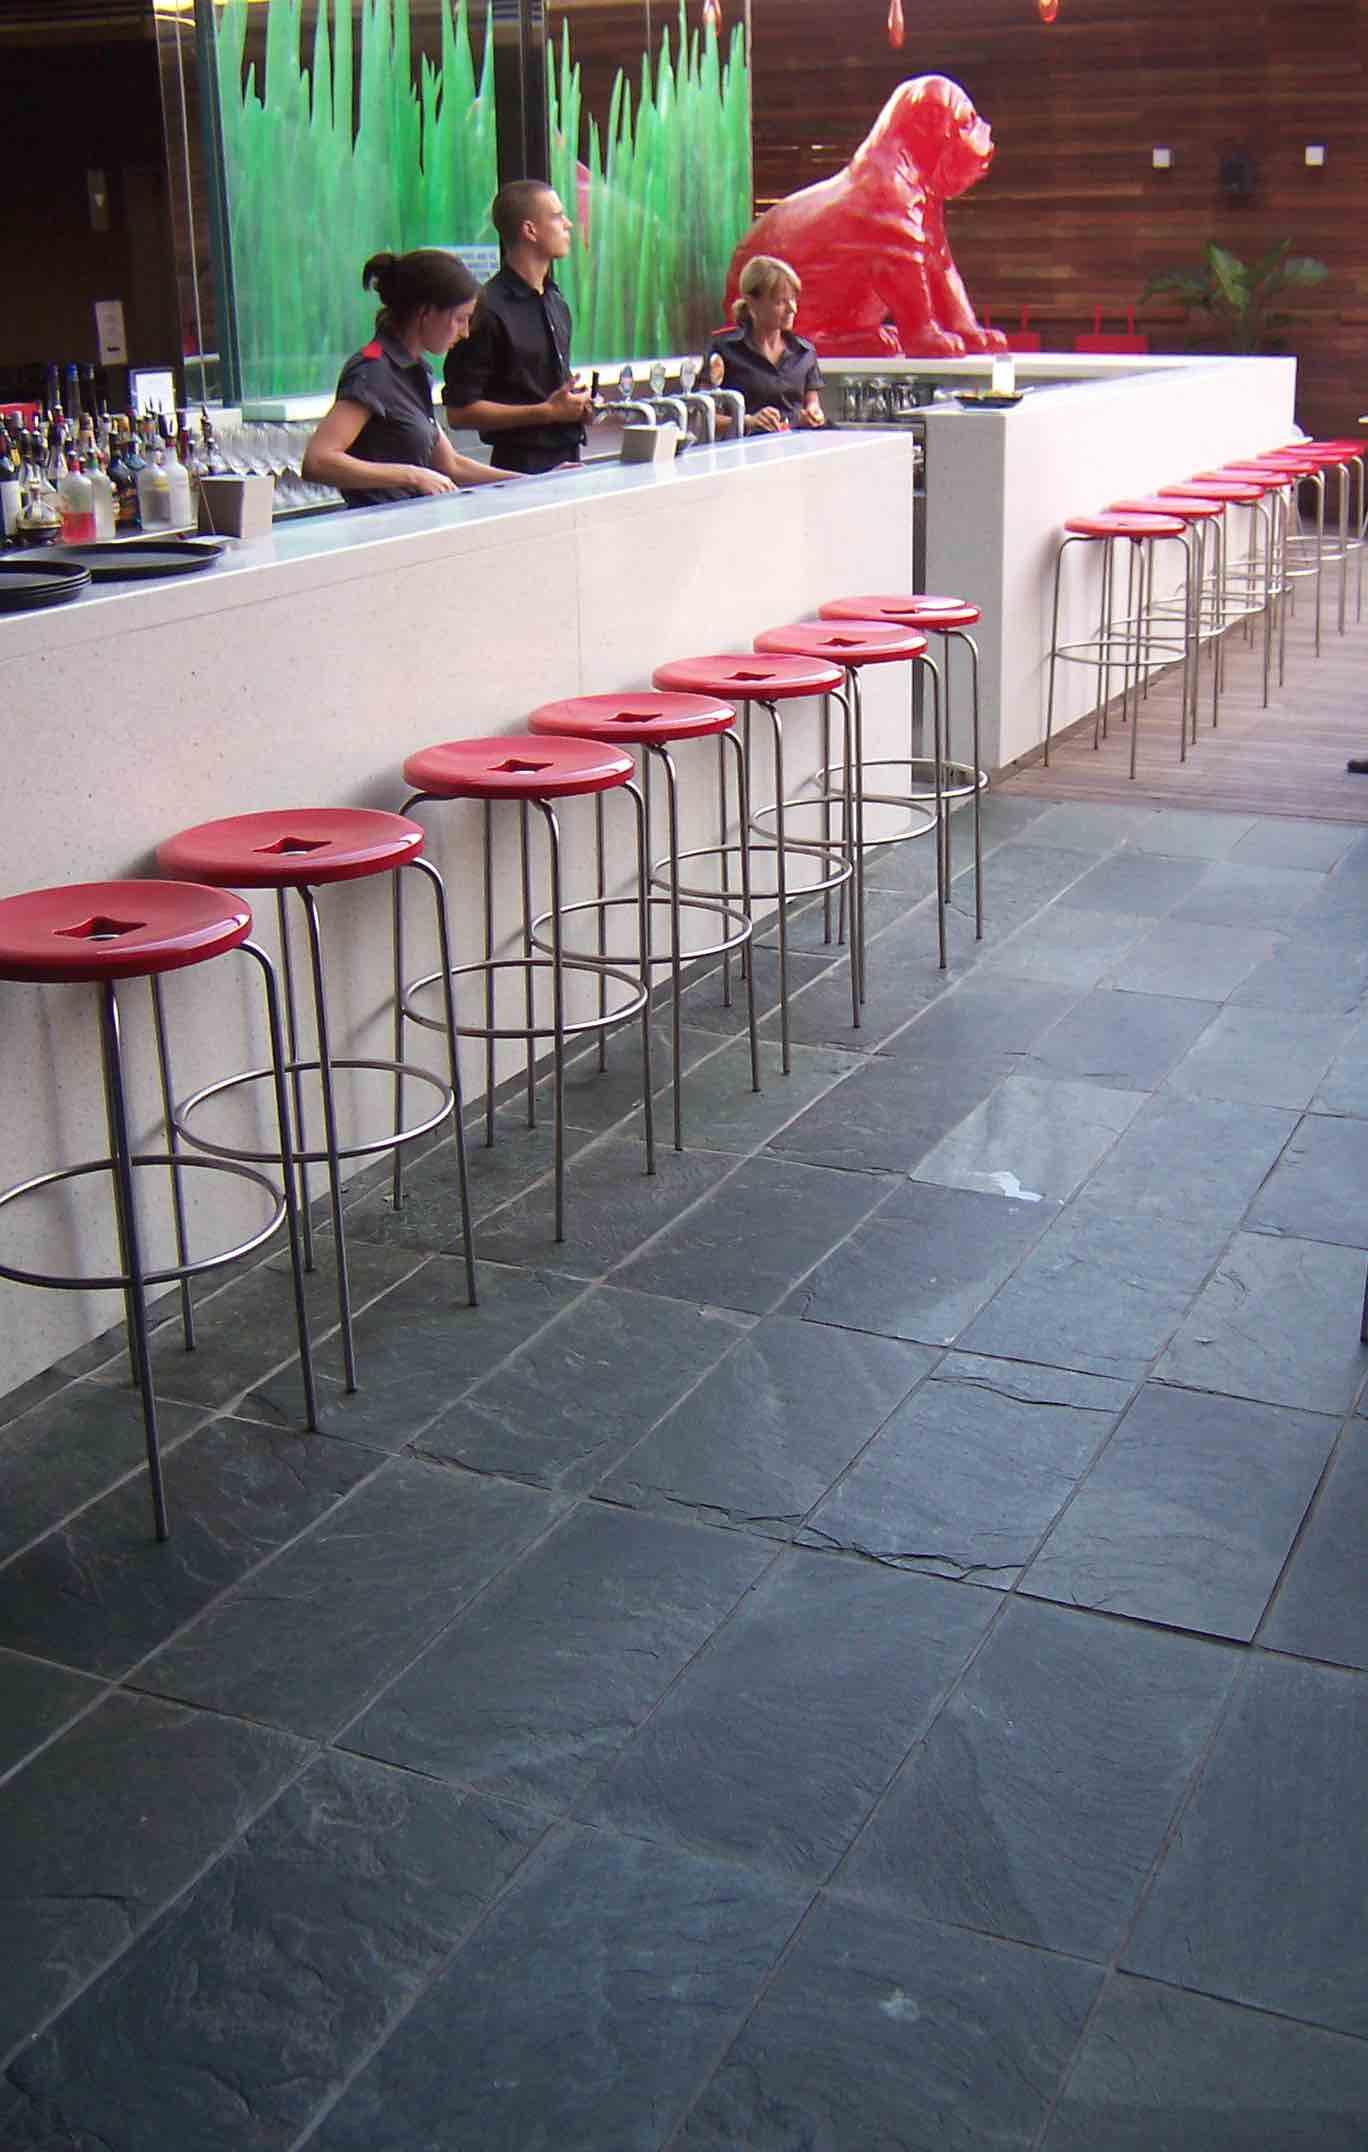 Arctic Green Floor Slate - The Eastern Hotel, Sydney